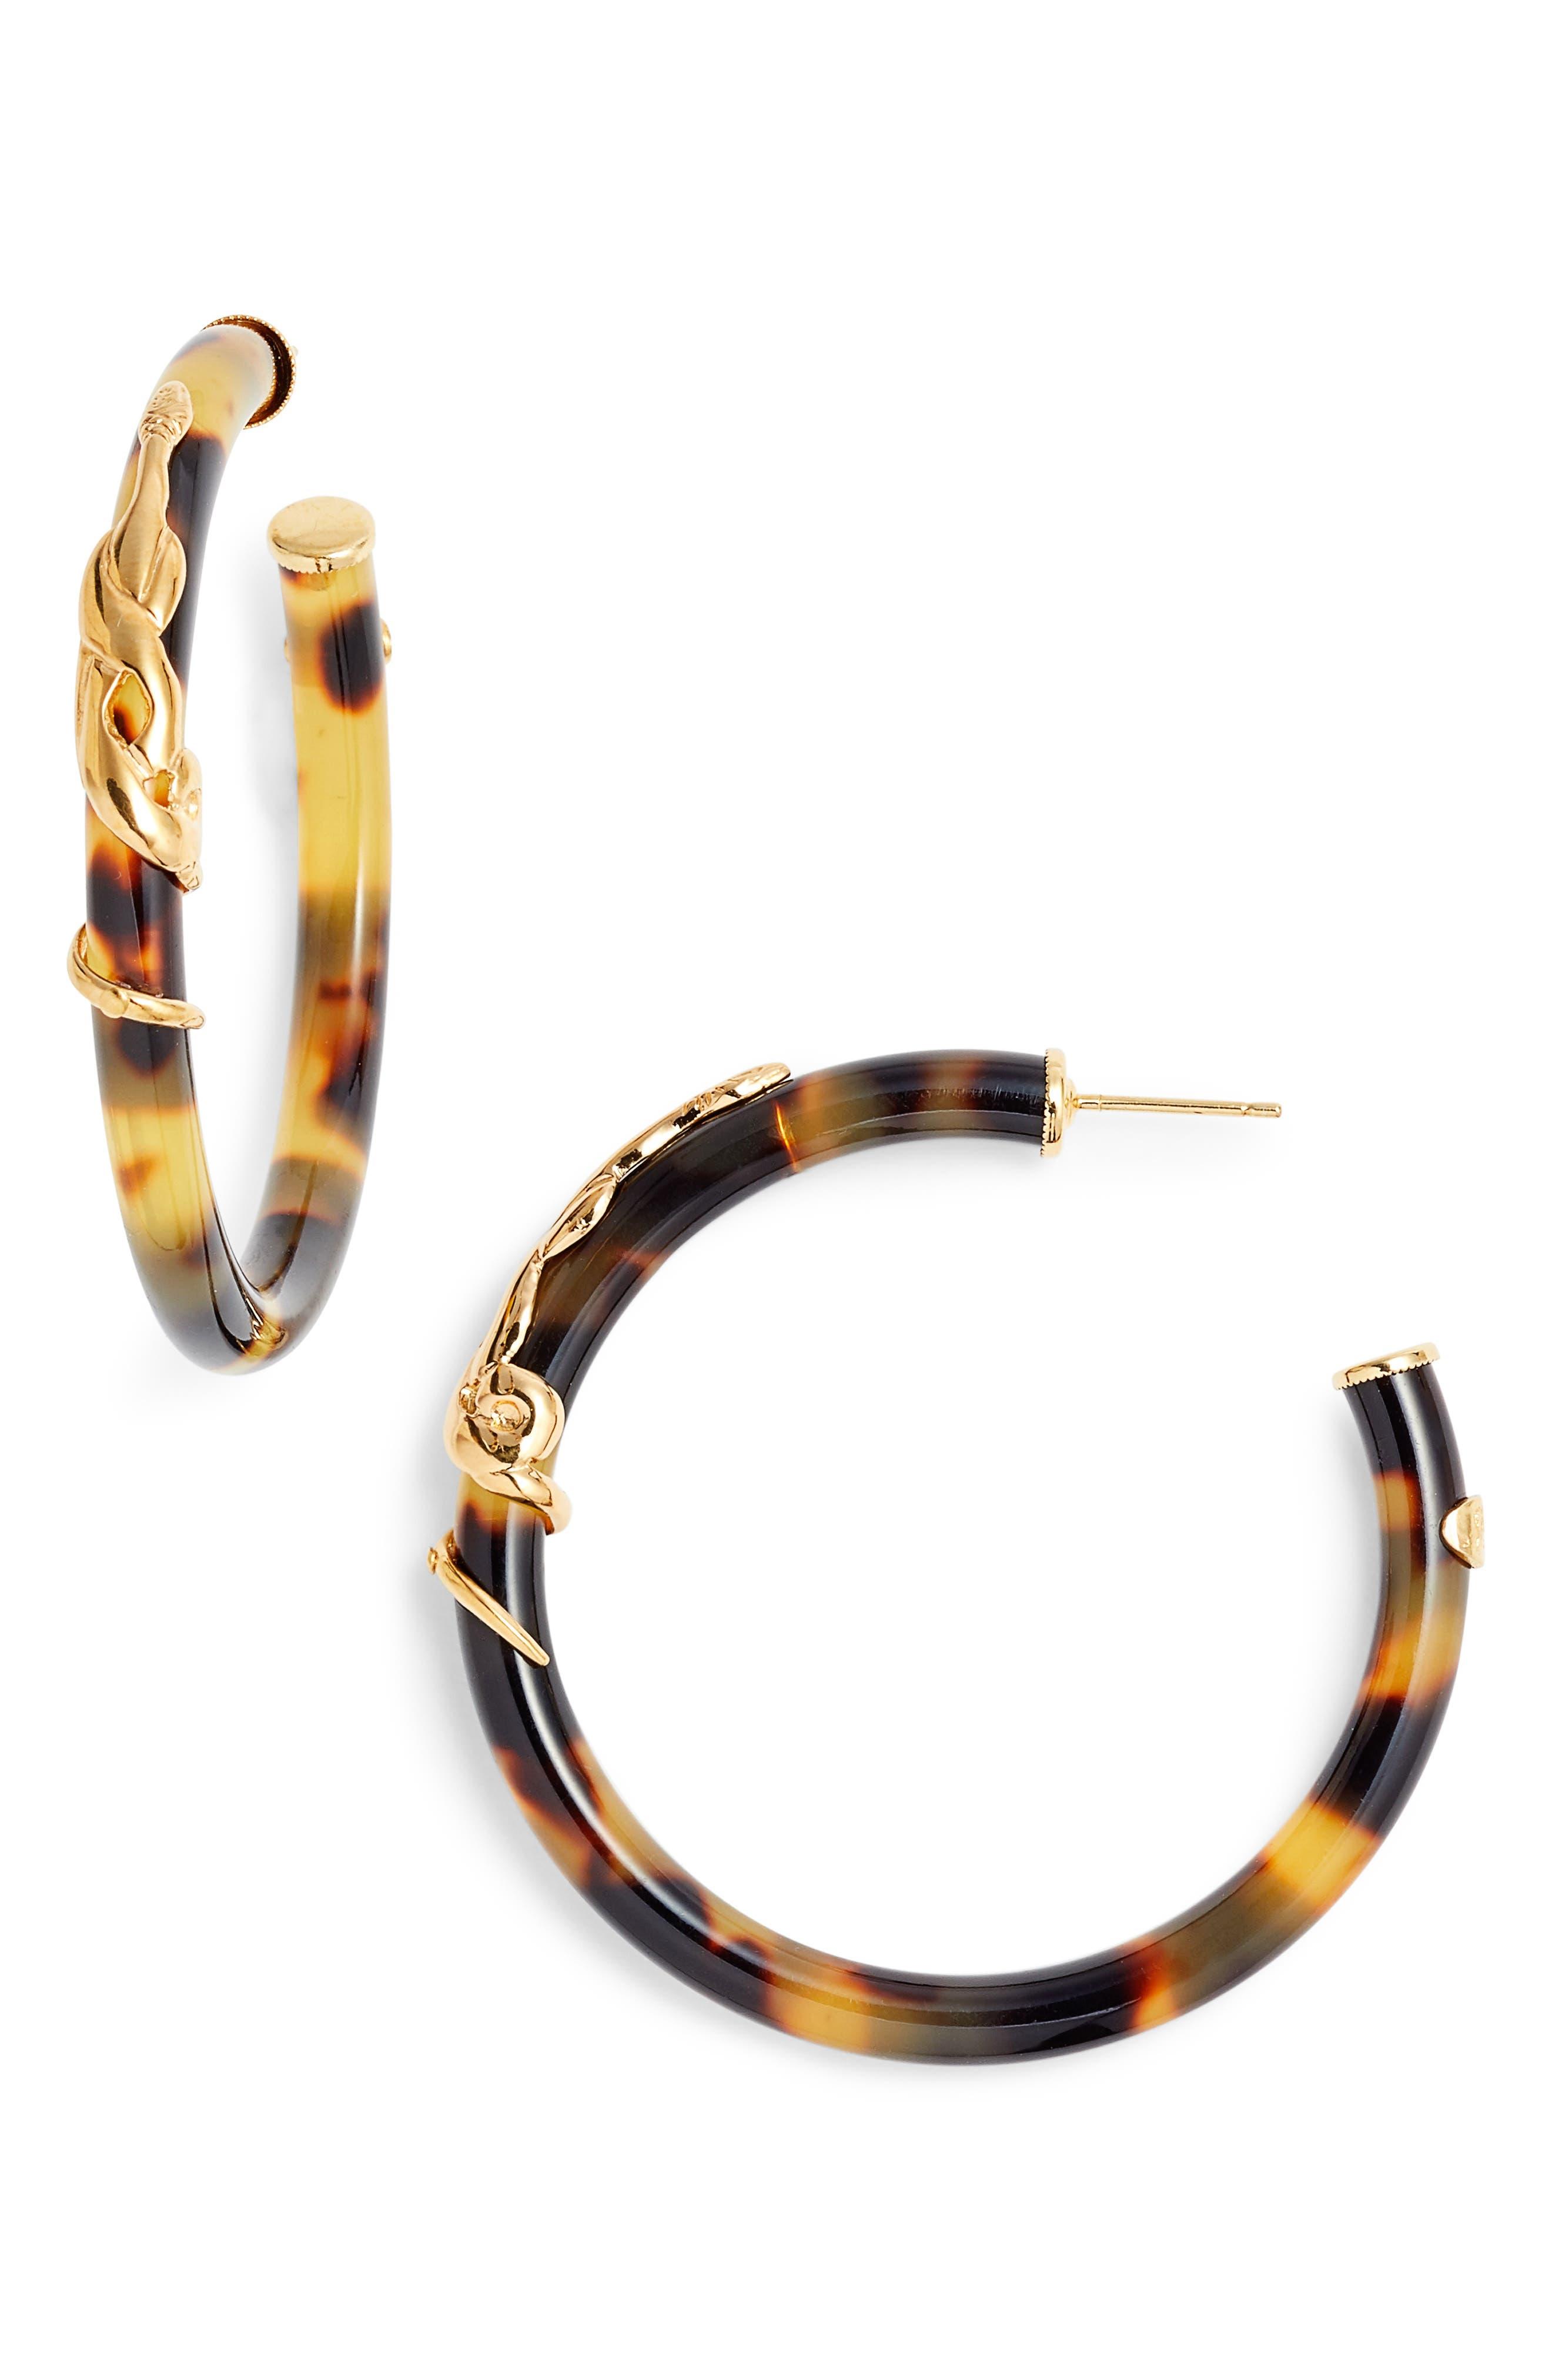 Cobra Hoop Earrings,                             Main thumbnail 1, color,                             210